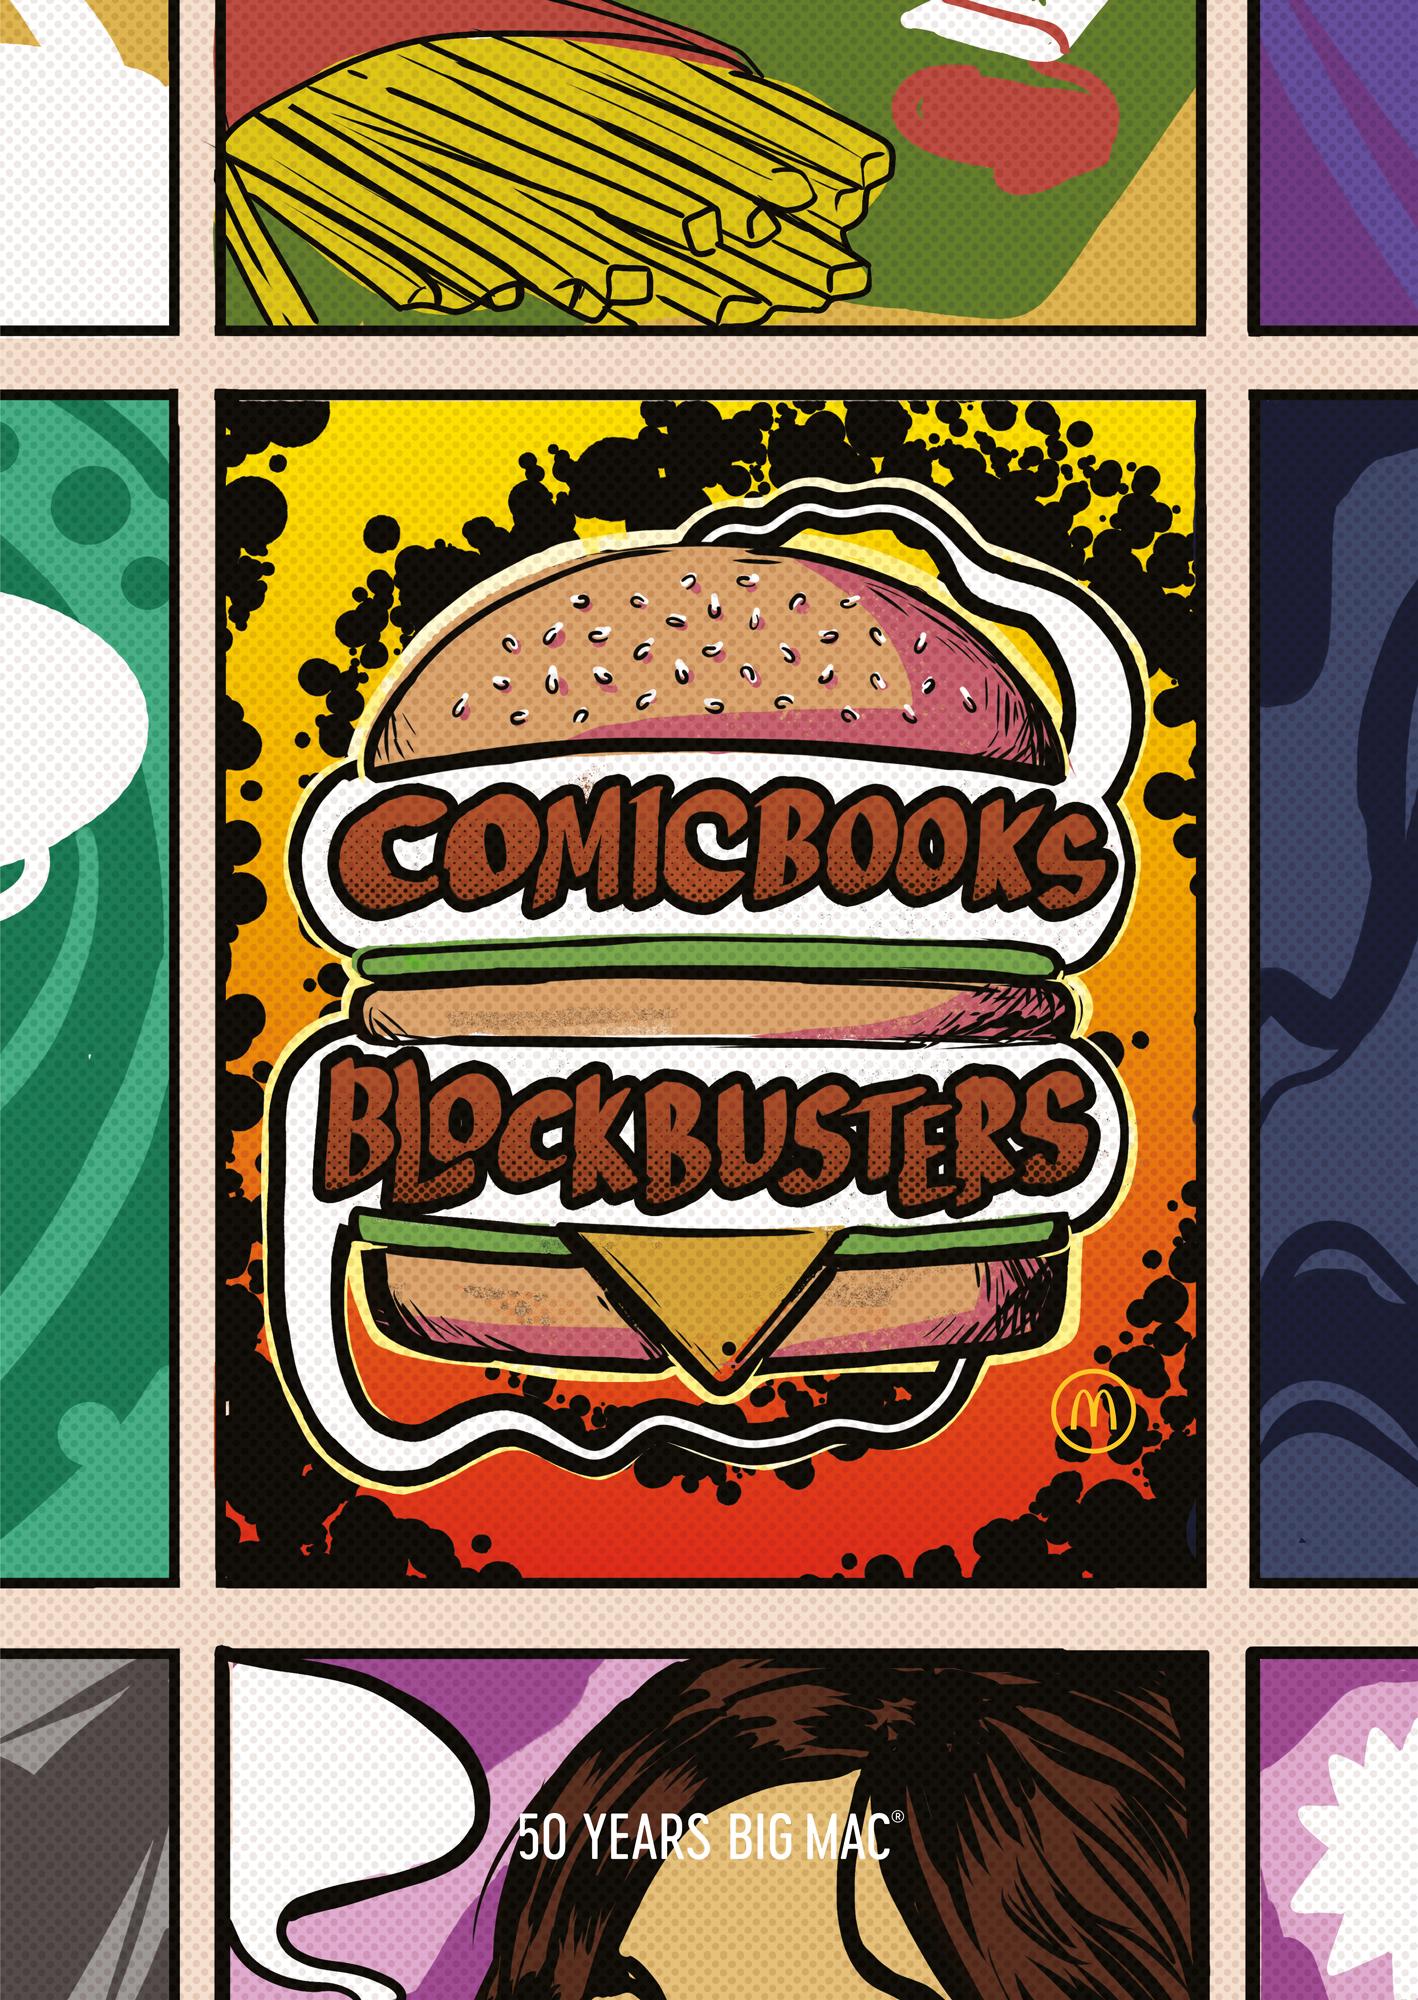 33_Comicbooks_Blockbusters.jpg